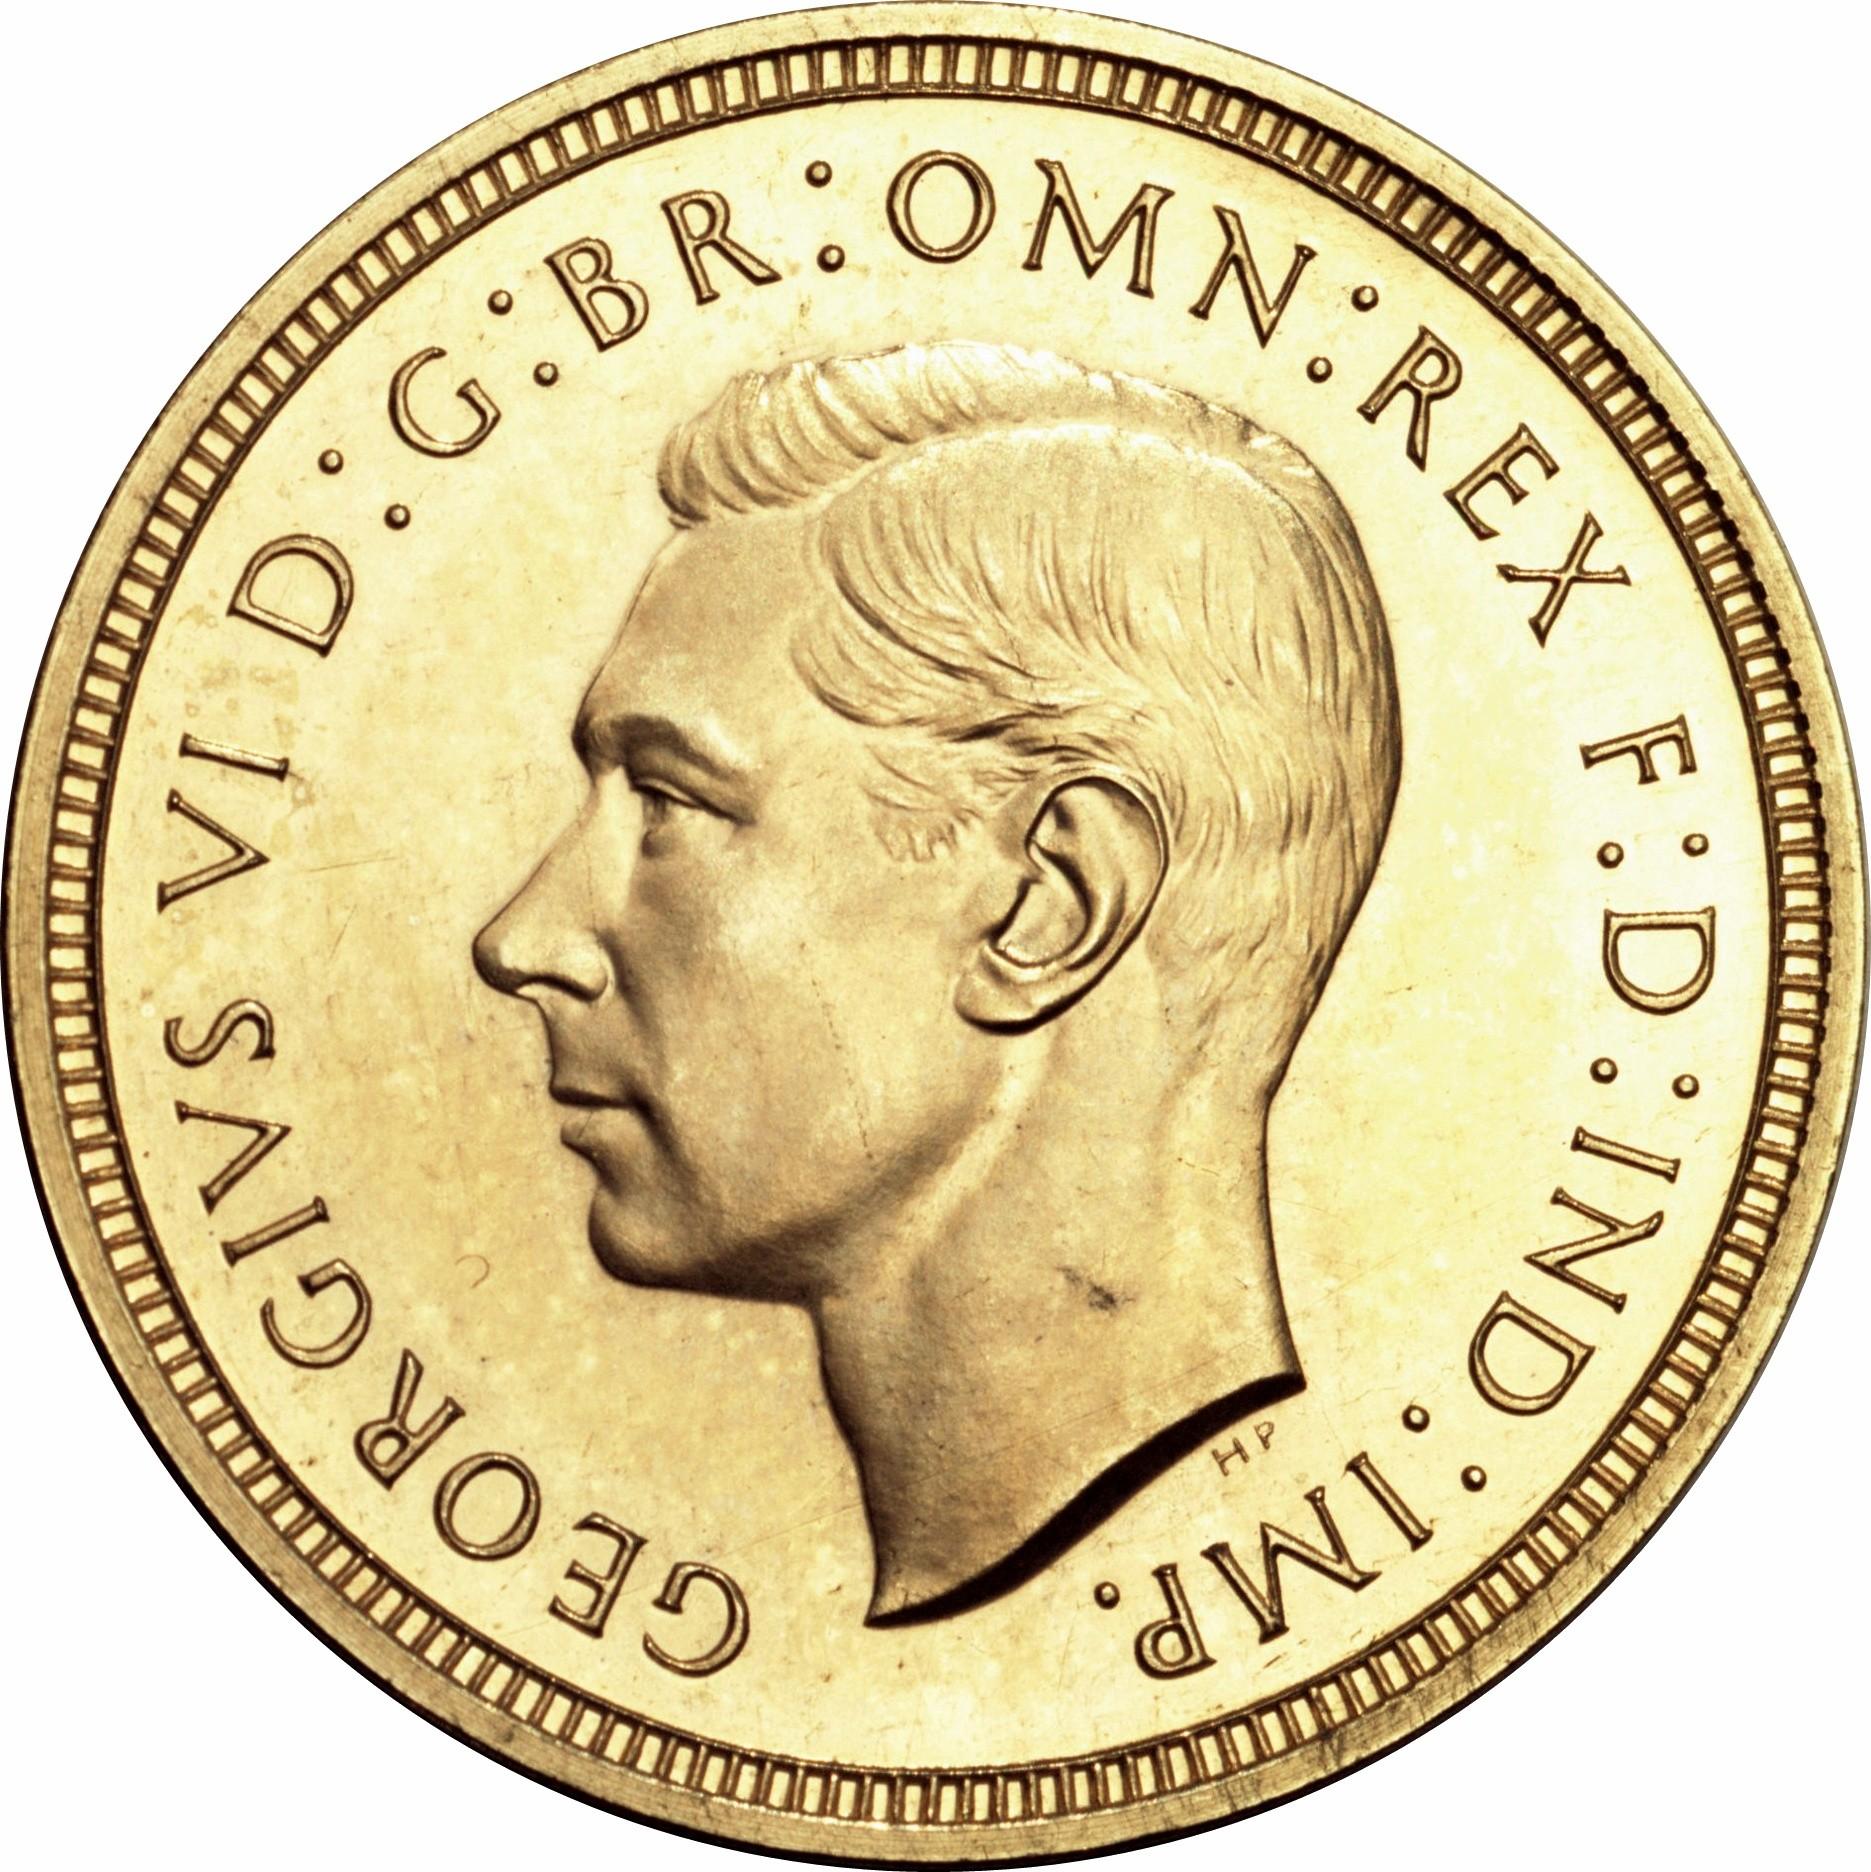 British 1 Sovereign (1937 George VI)